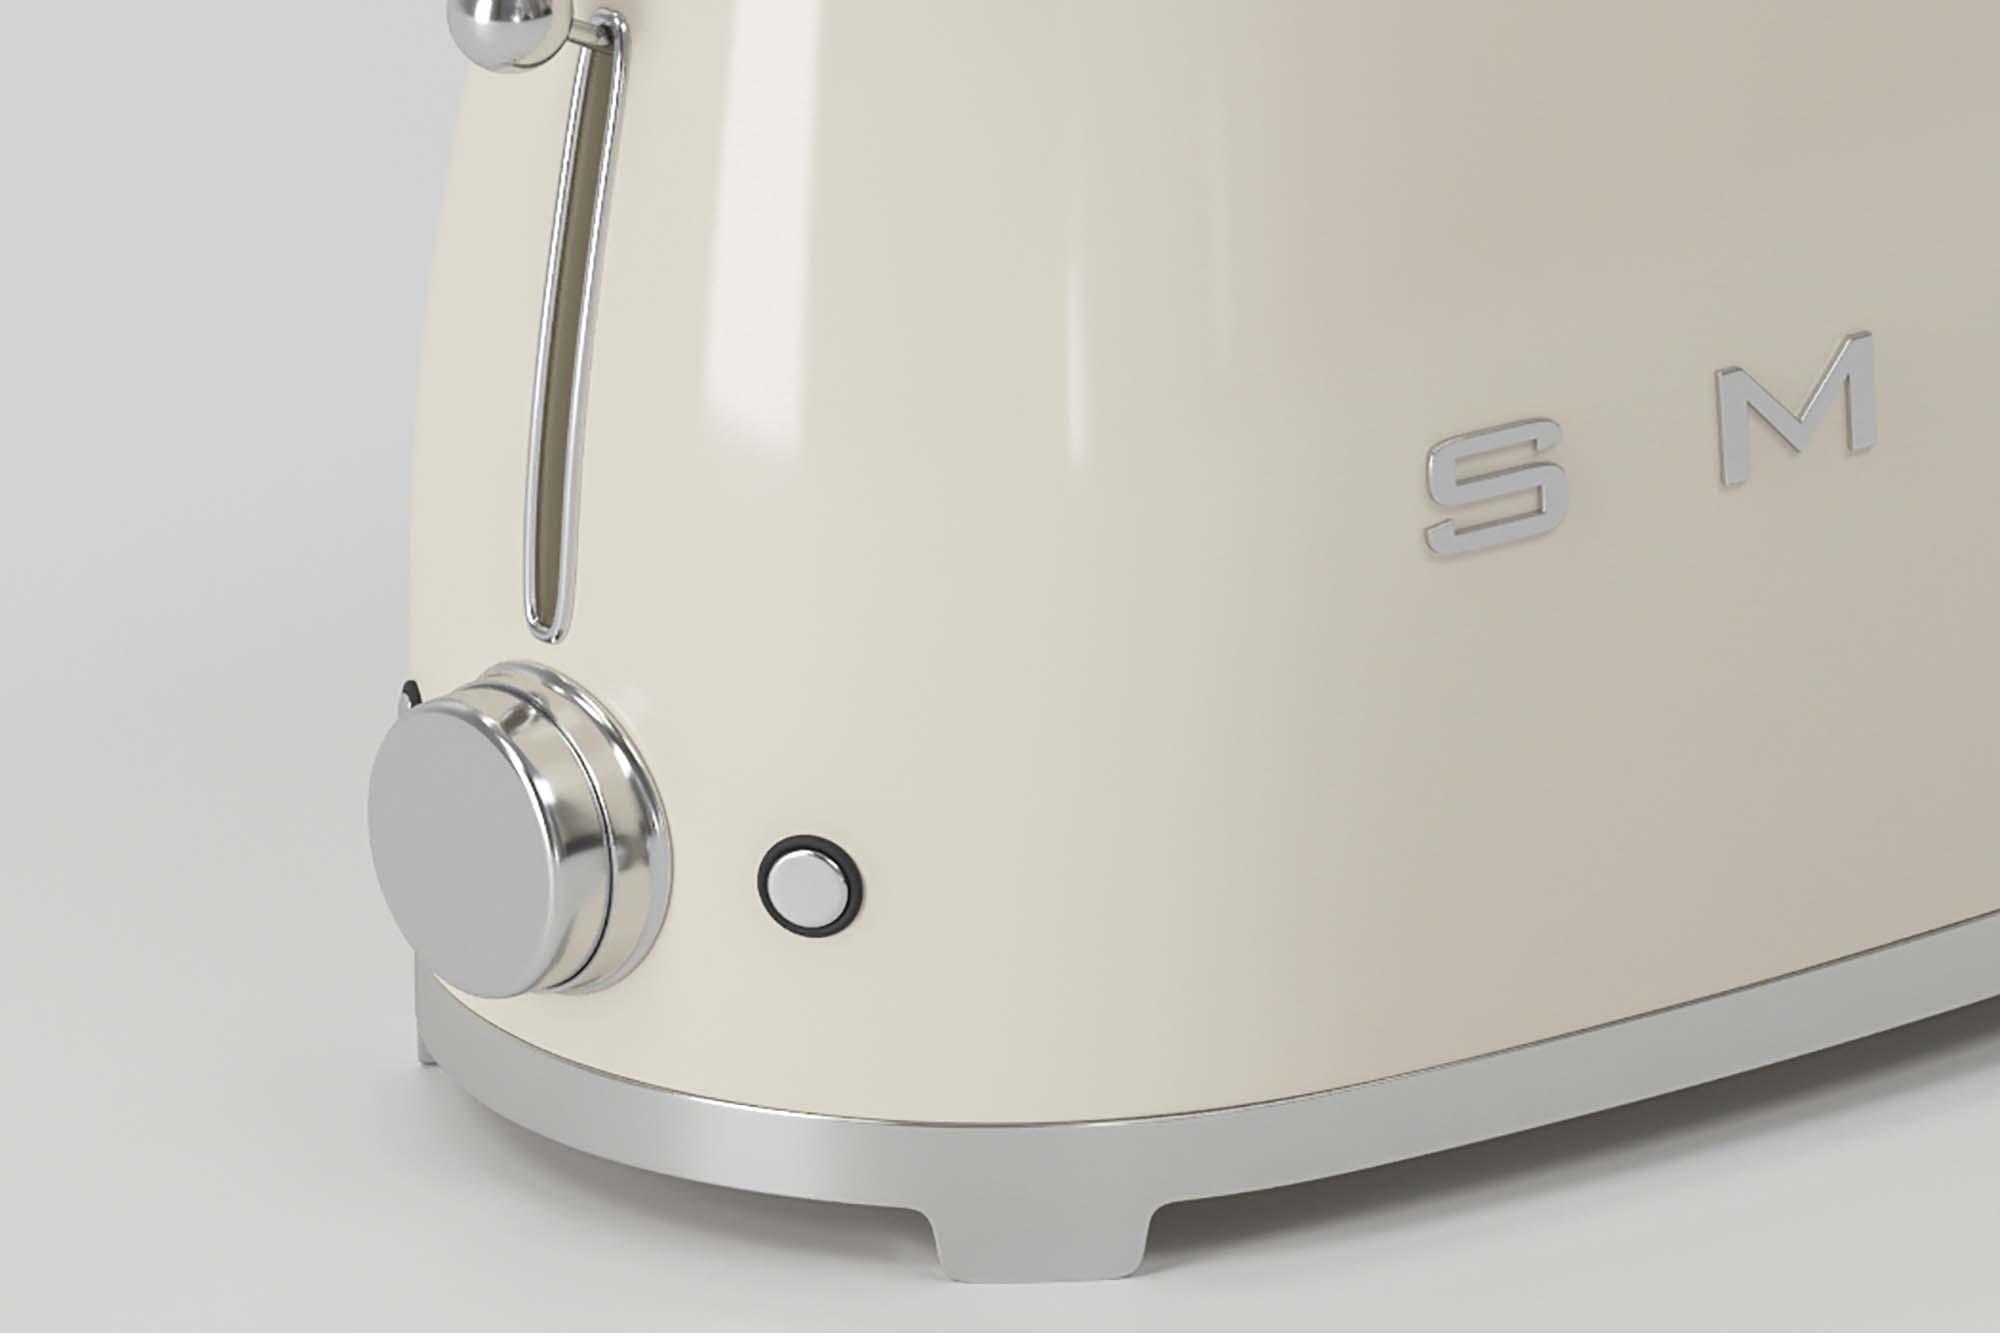 Smeg Toaster 3D Model 2